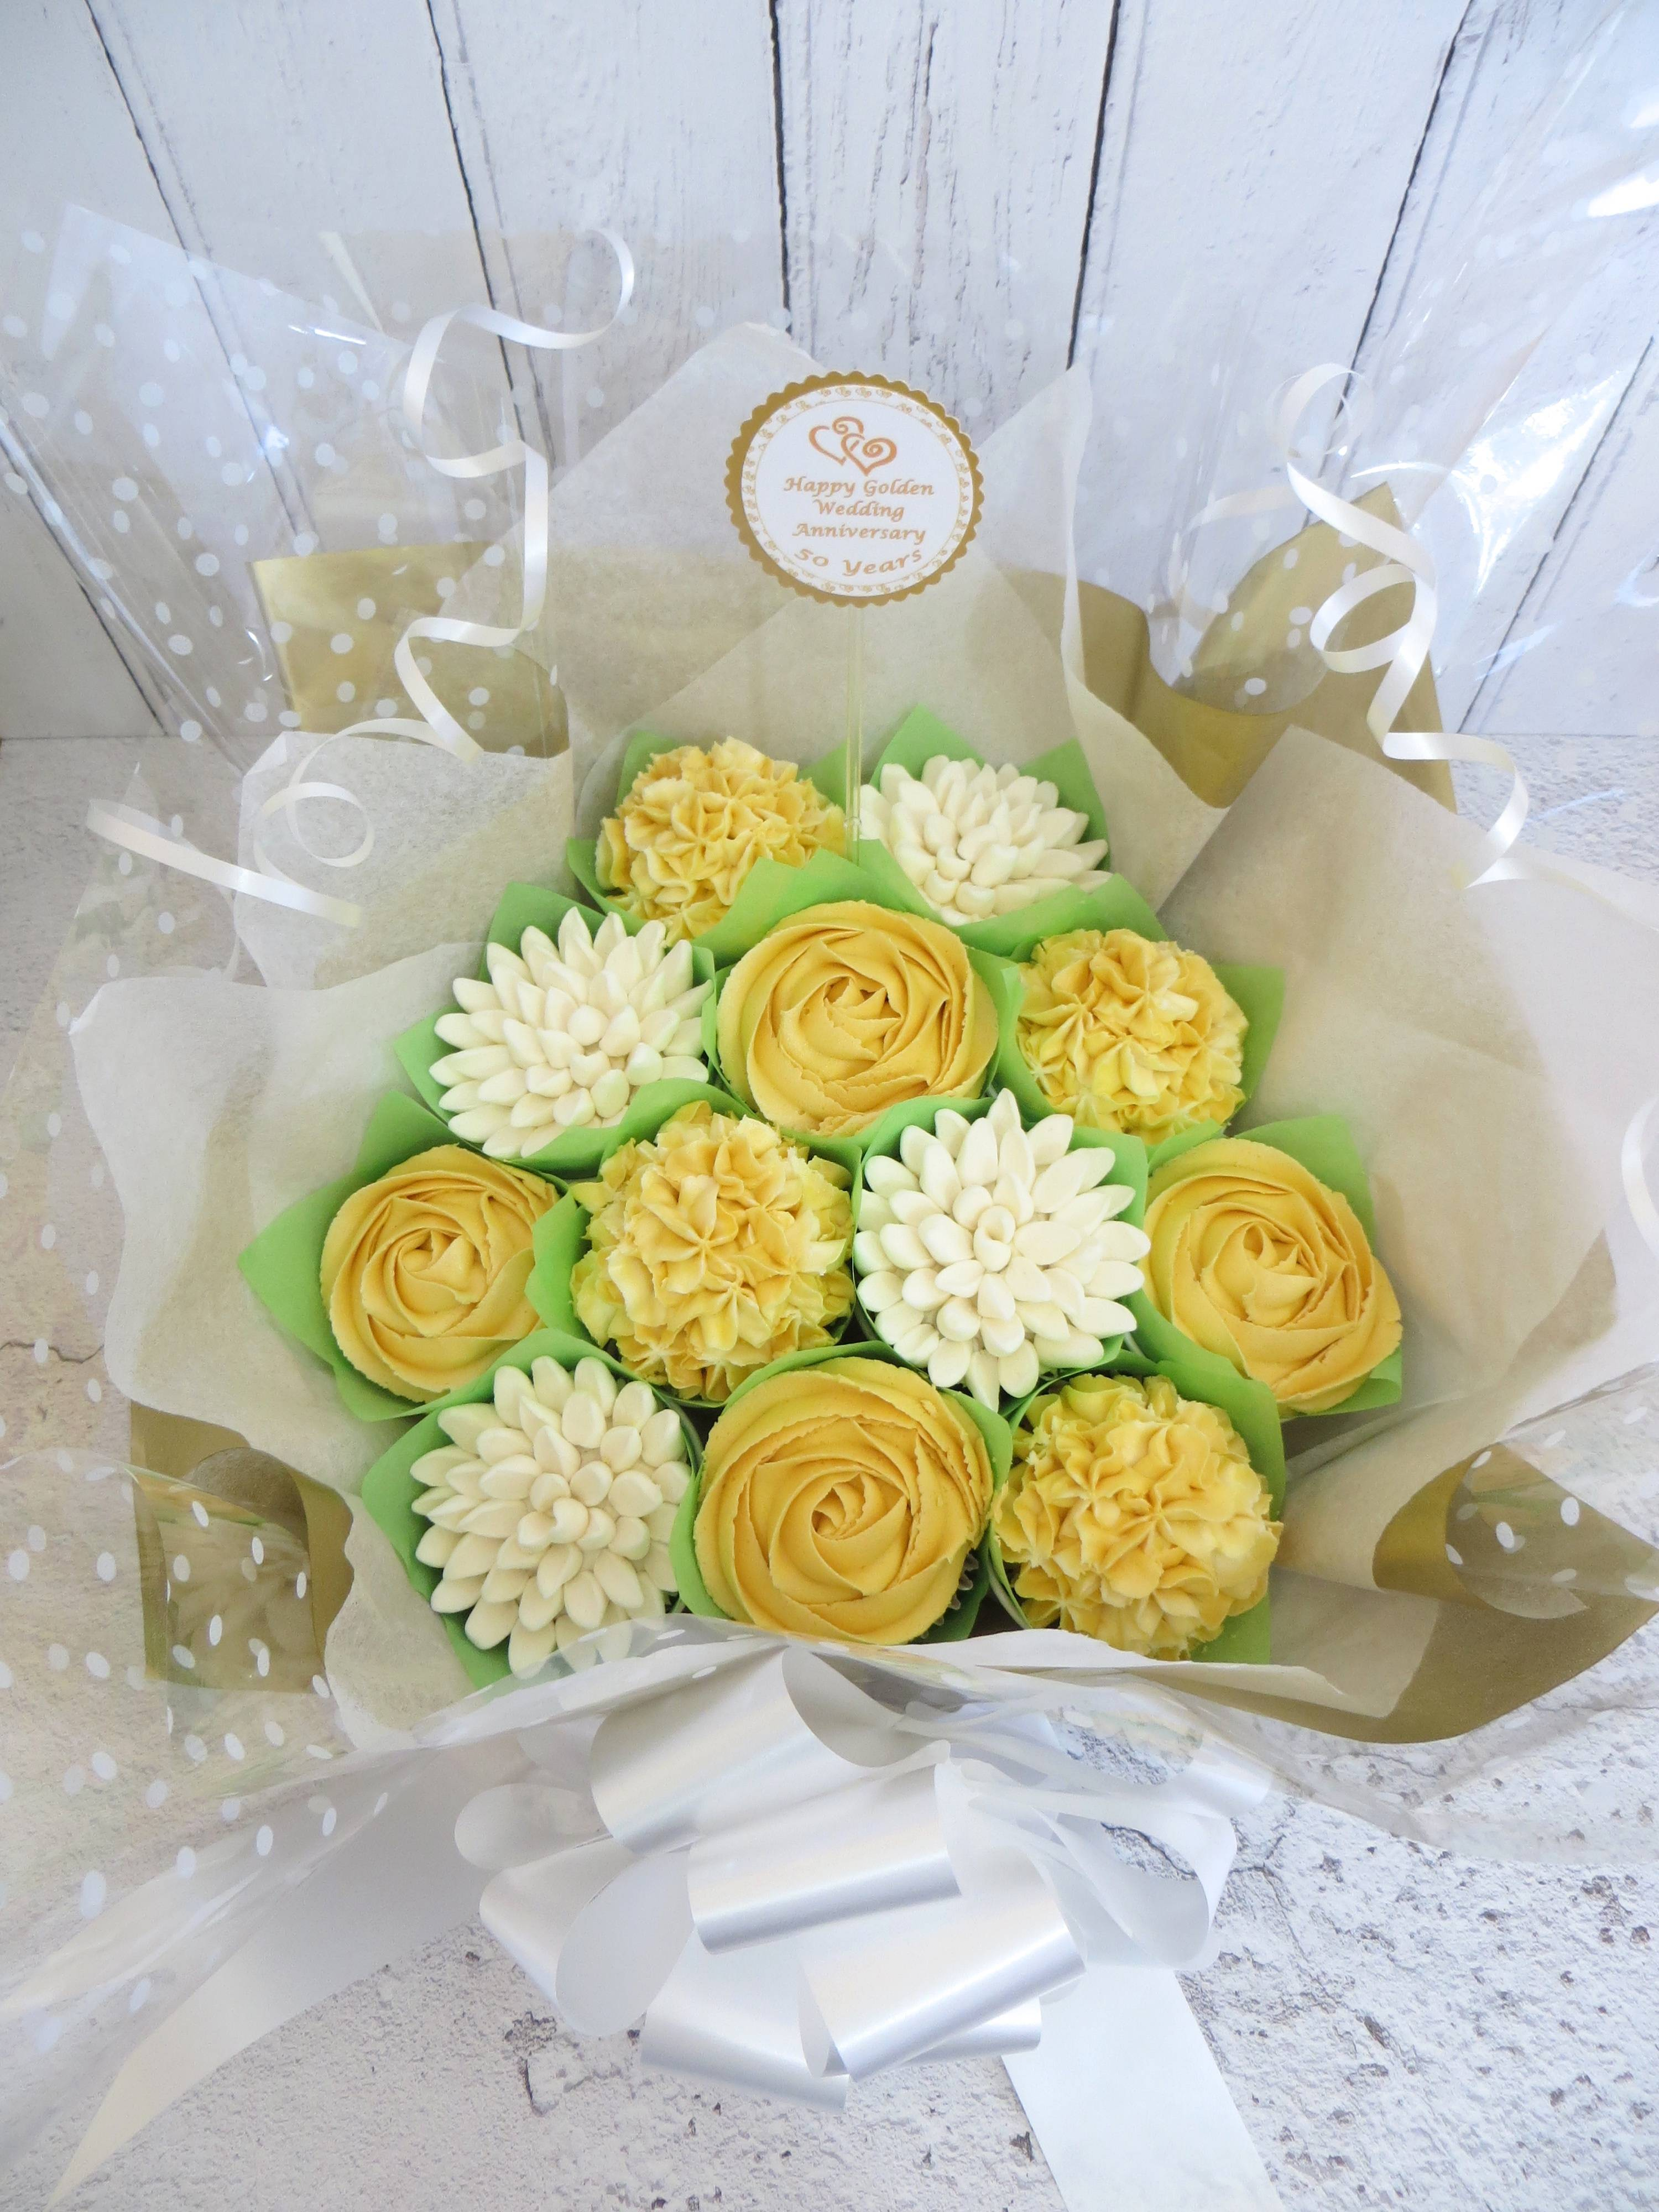 Golden Wedding Anniversary Cupcake Bouquet